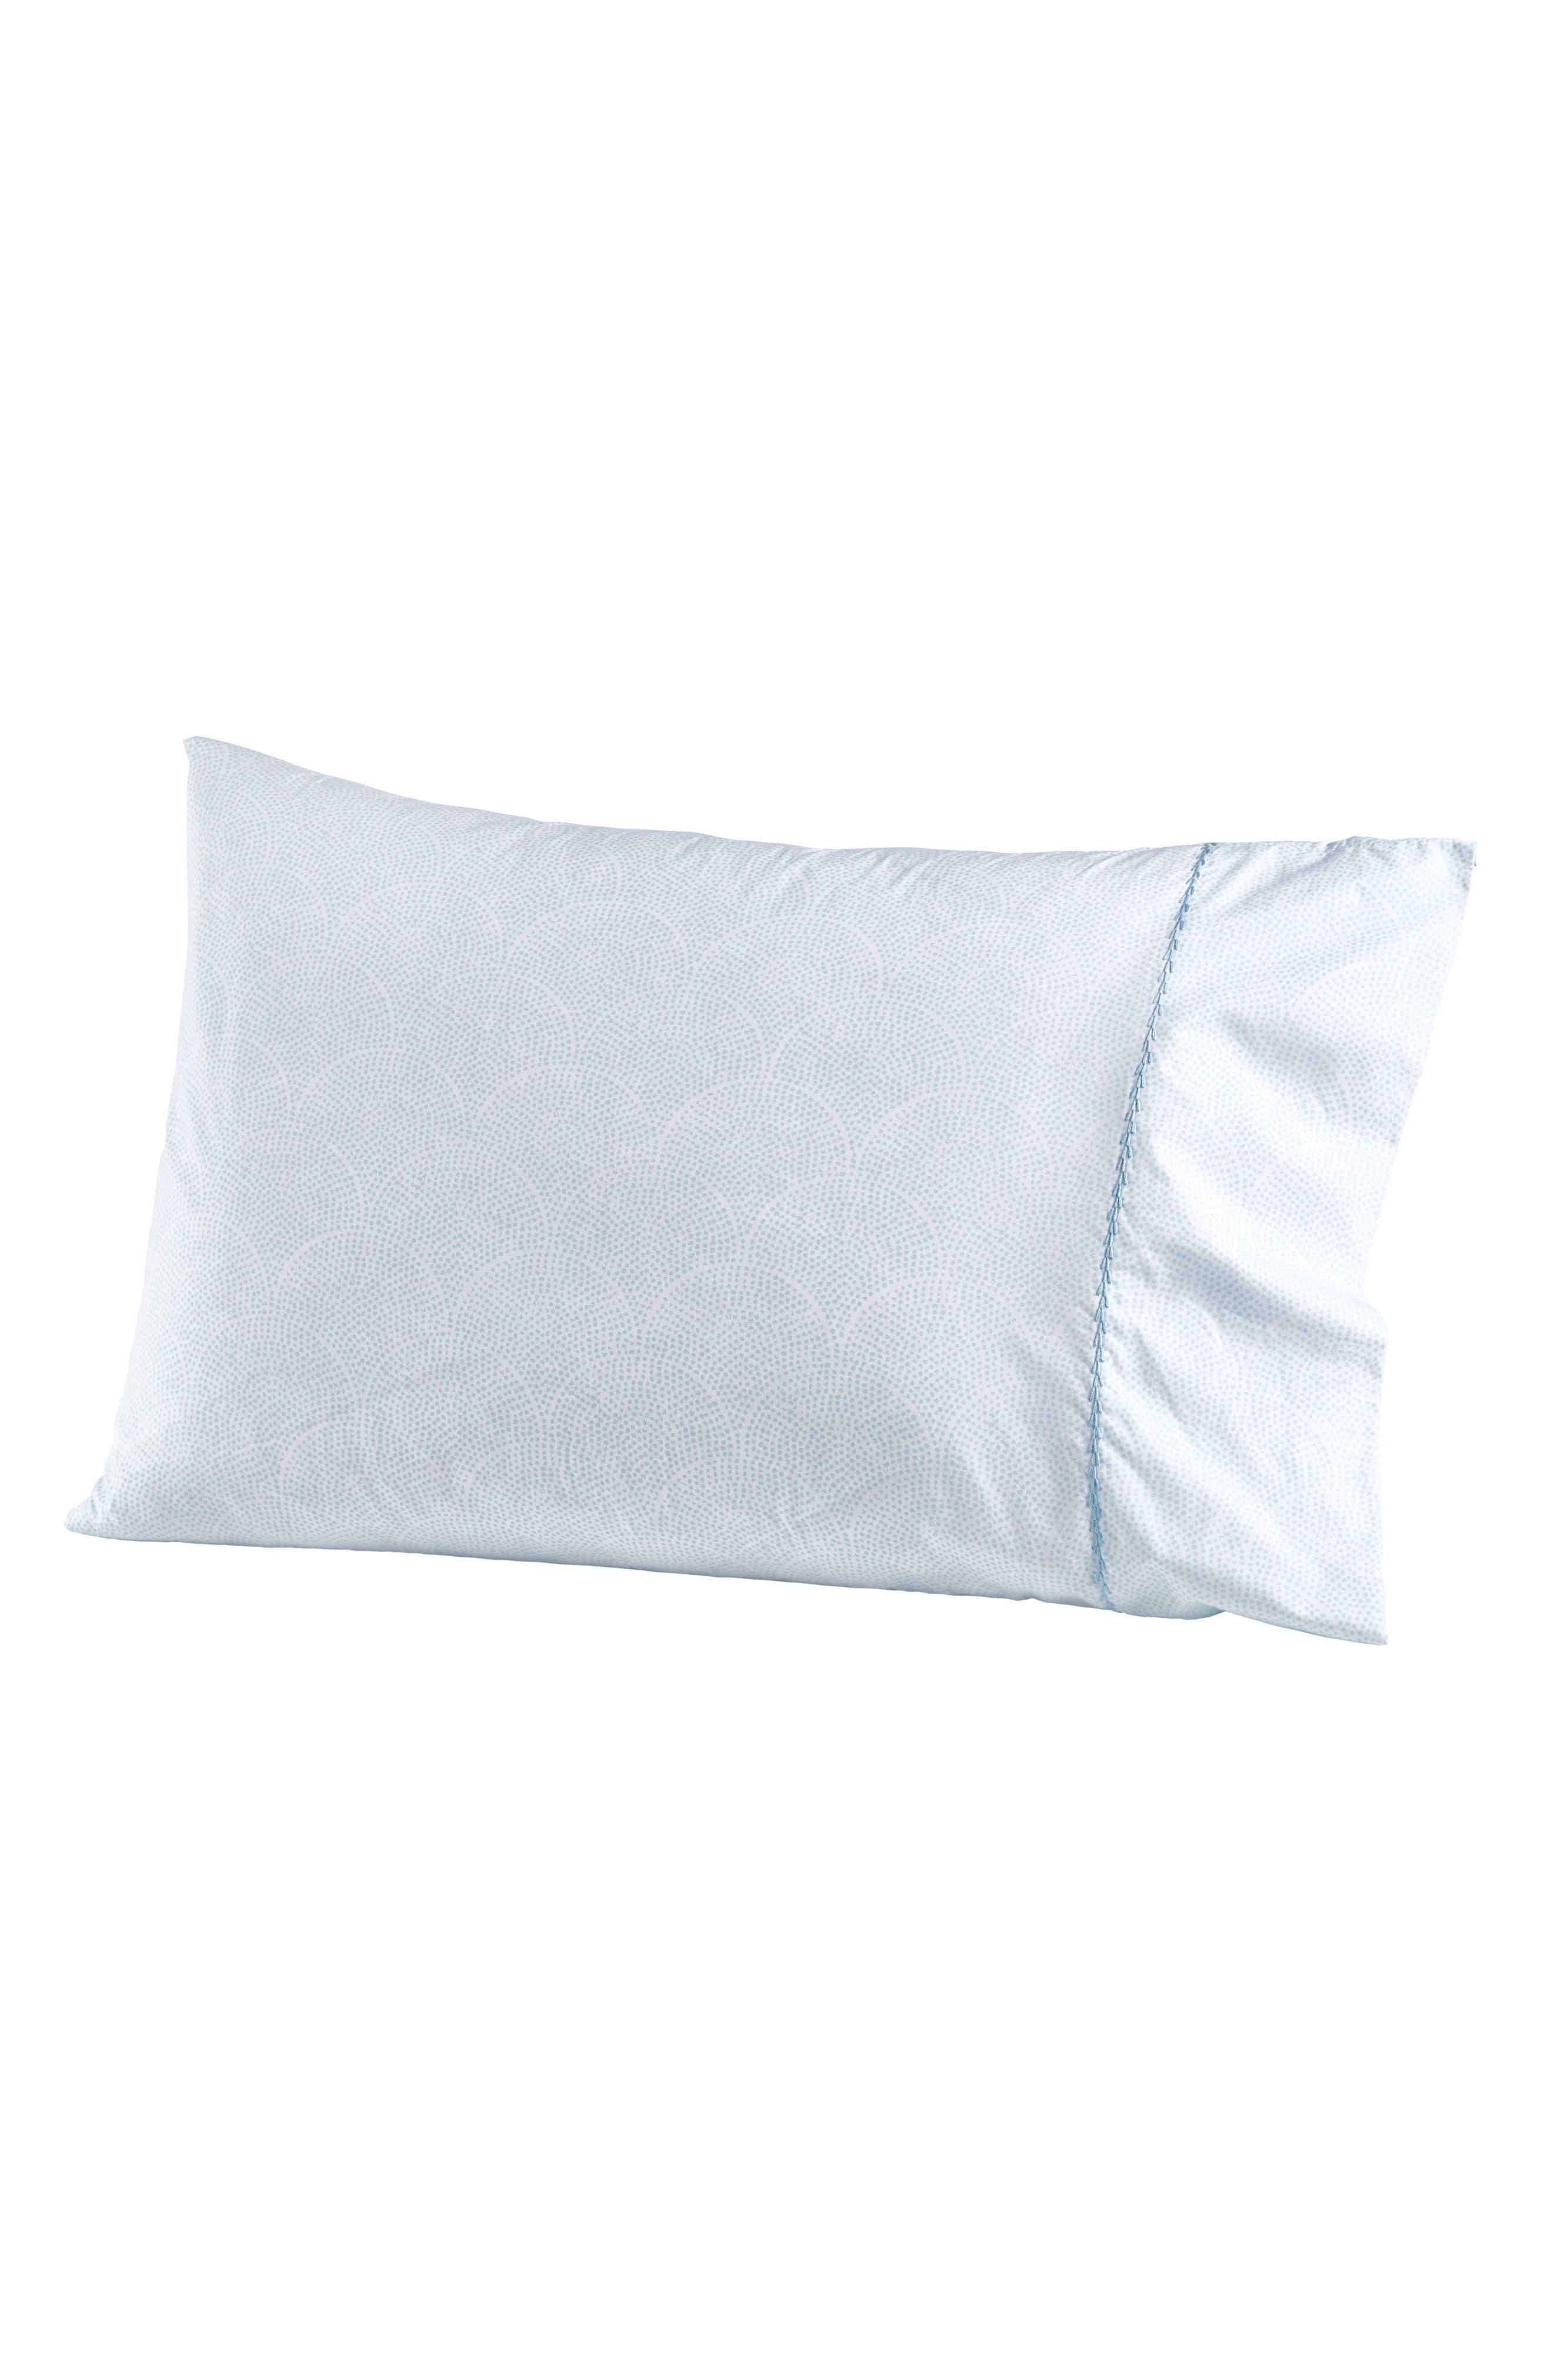 Main Image - John Robshaw Vatula 400 Thread Count Pillowcases